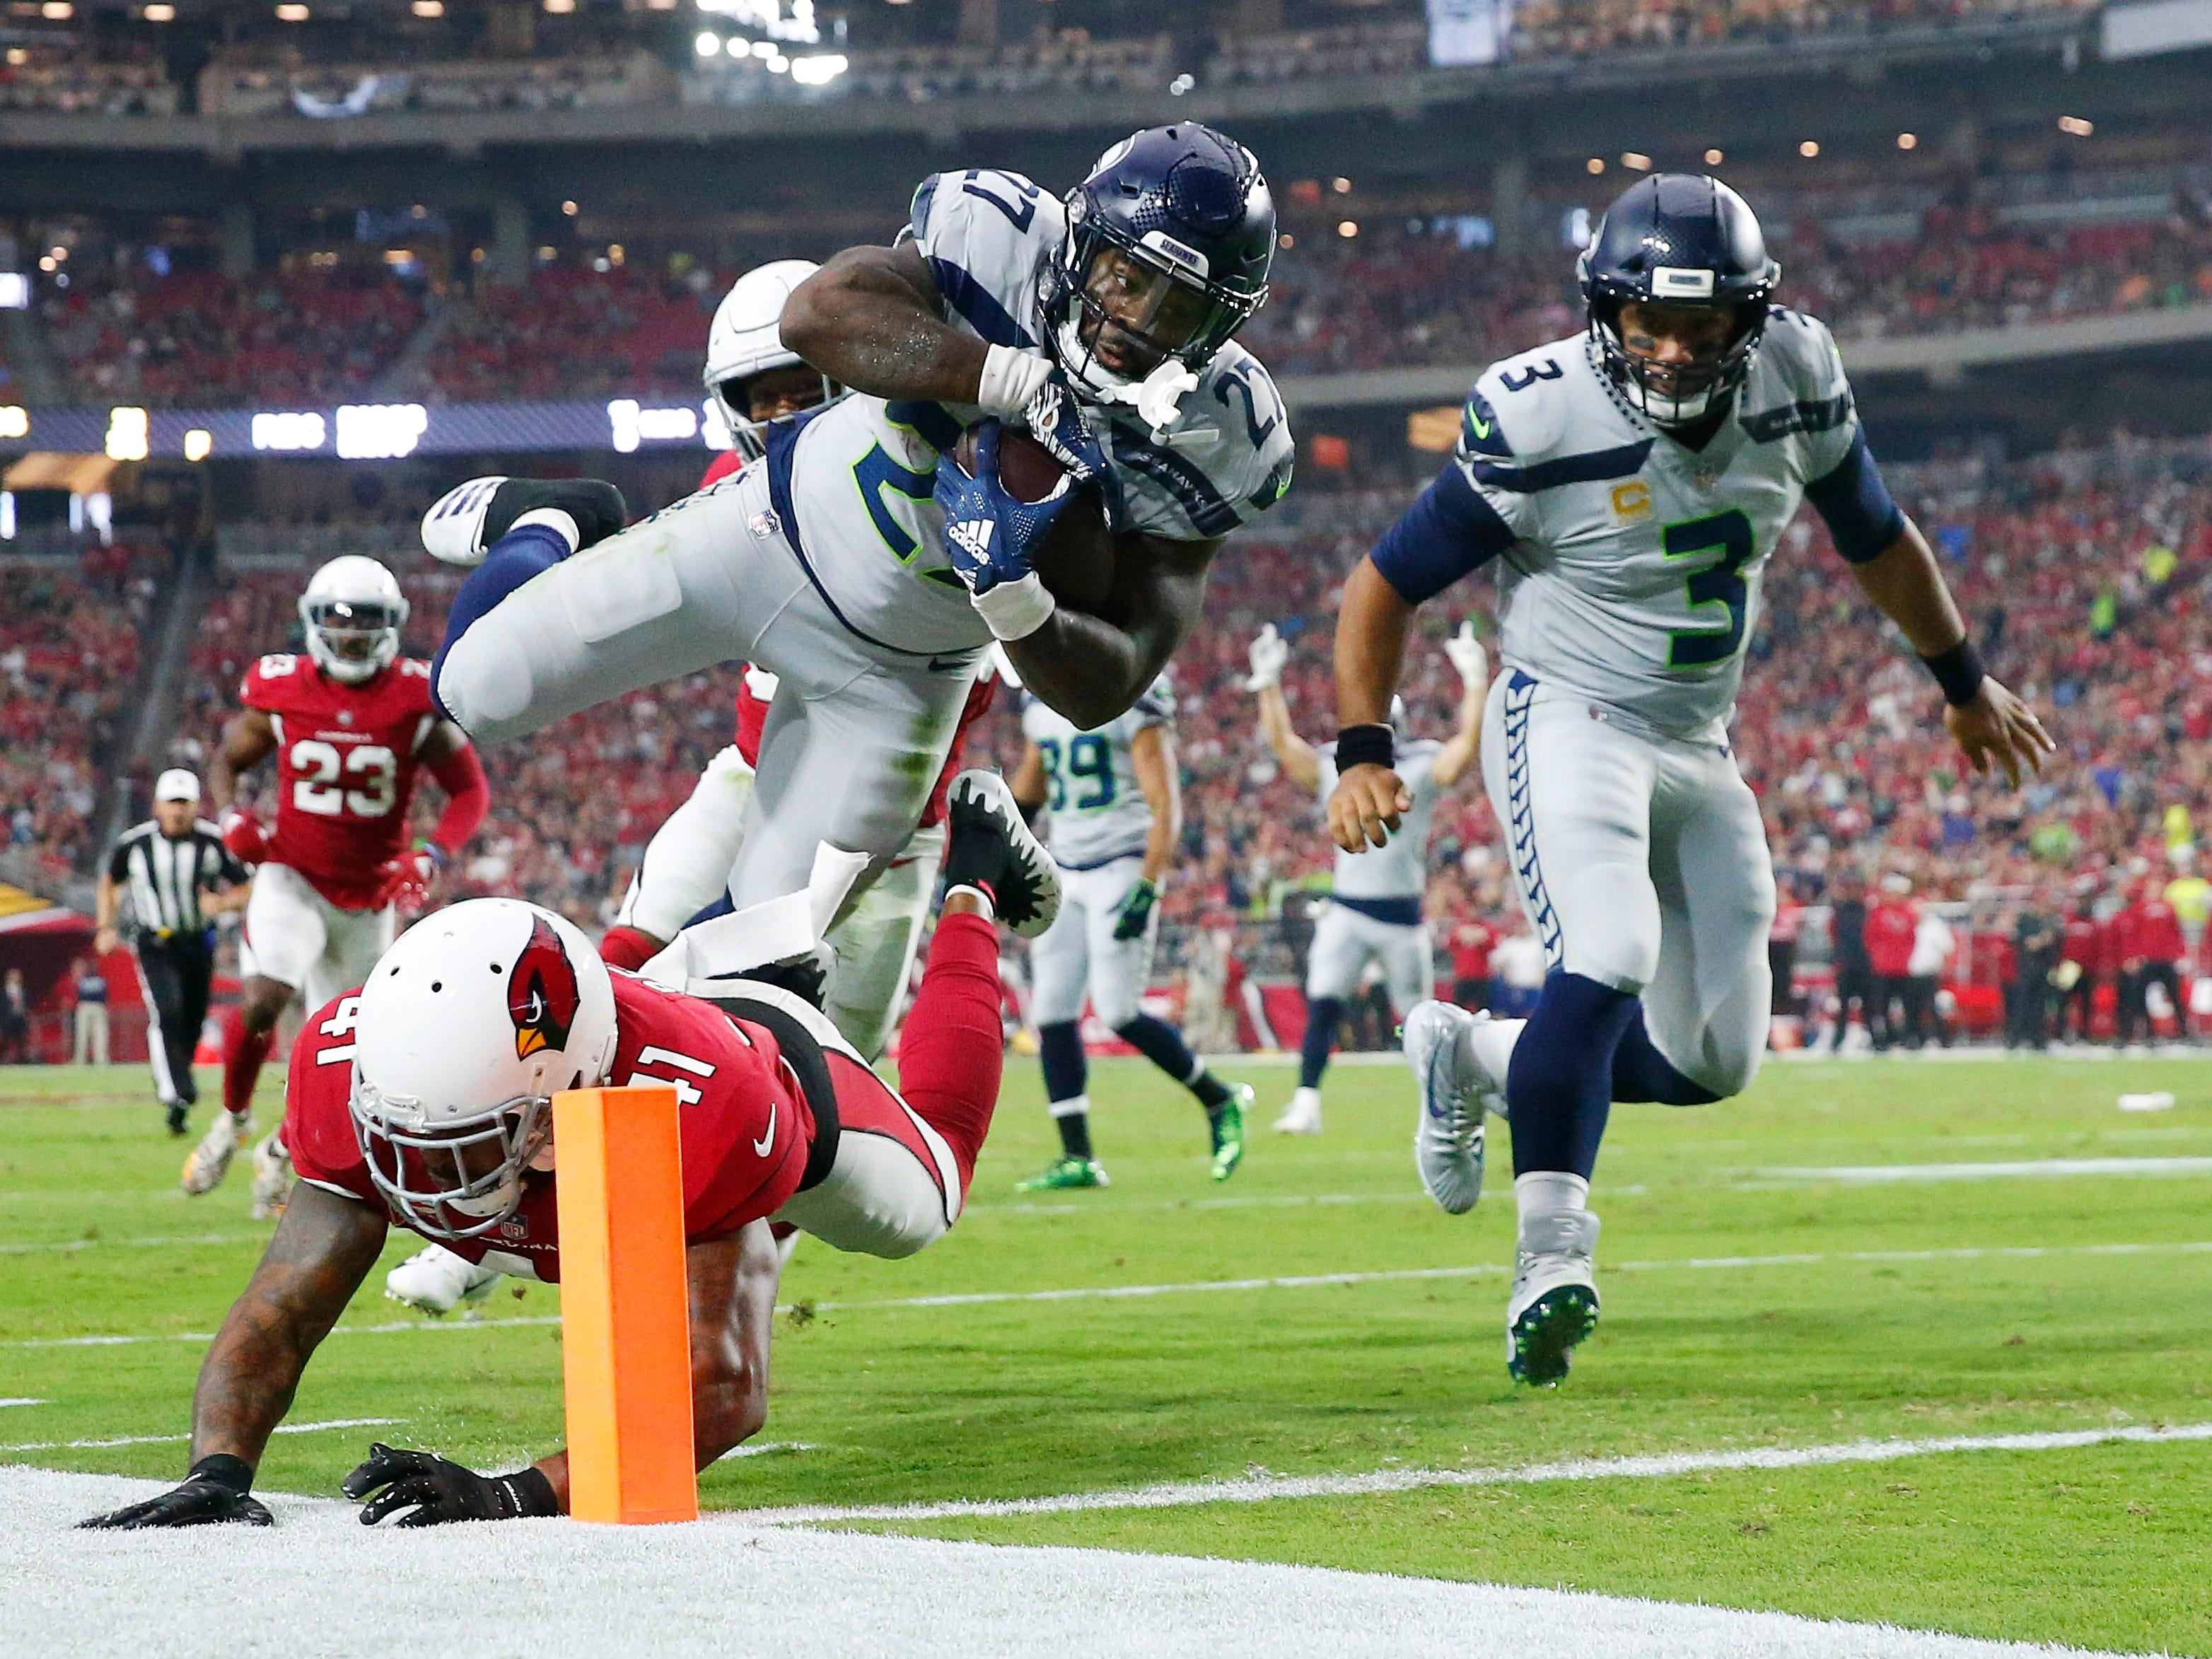 Seattle Seahawks running back Mike Davis (27) scores over Arizona Cardinals defensive back Antoine Bethea (41) during the first quarter at State Farm Stadium in Glendale, Ariz. September 30, 2018.